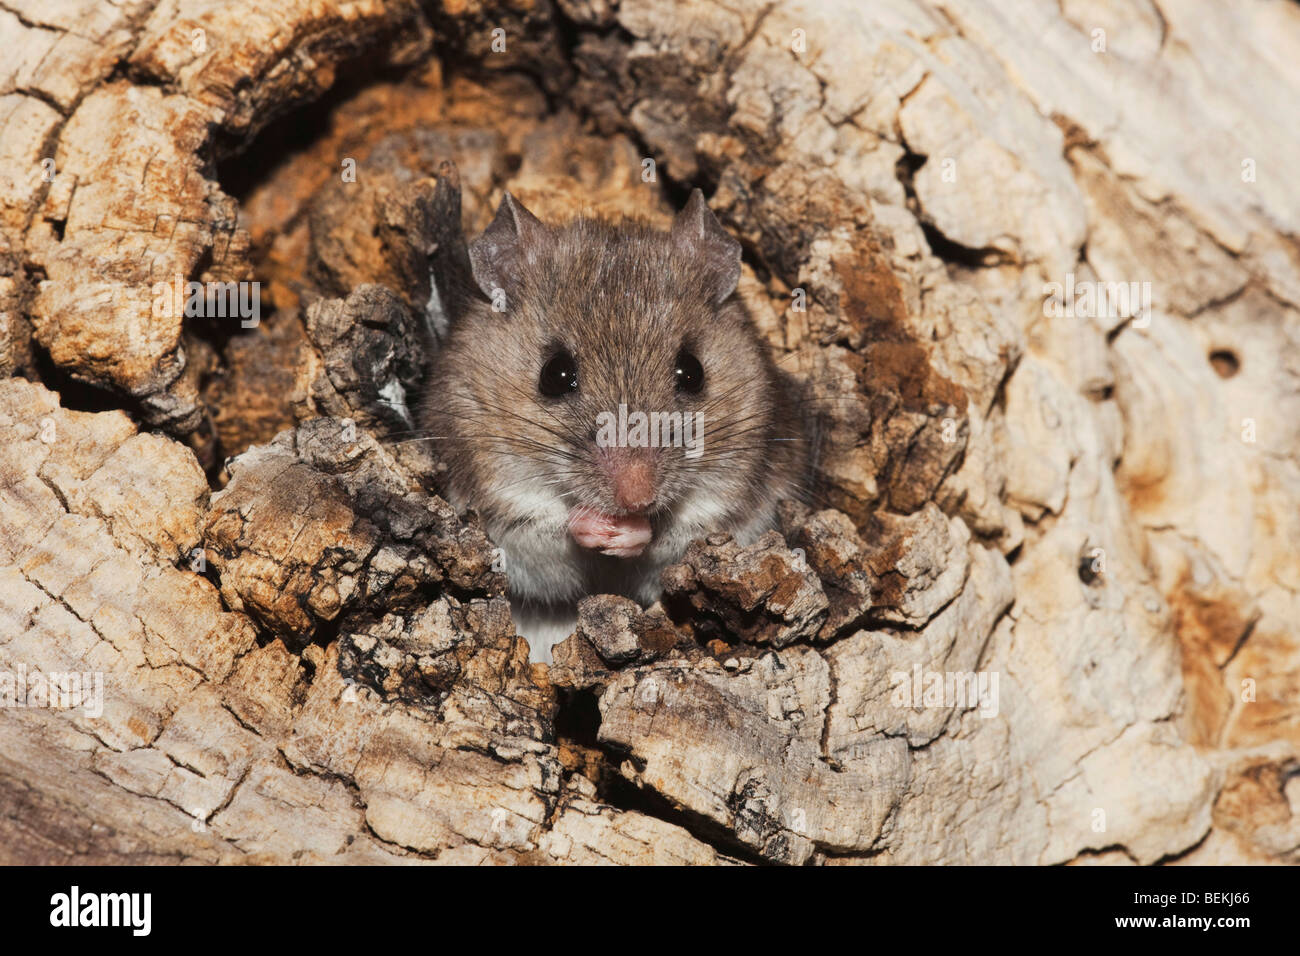 White-footed Mouse (Peromyscus leucopus), adult in tree hole, Sinton, Corpus Christi, Coastal Bend, Texas, USA - Stock Image